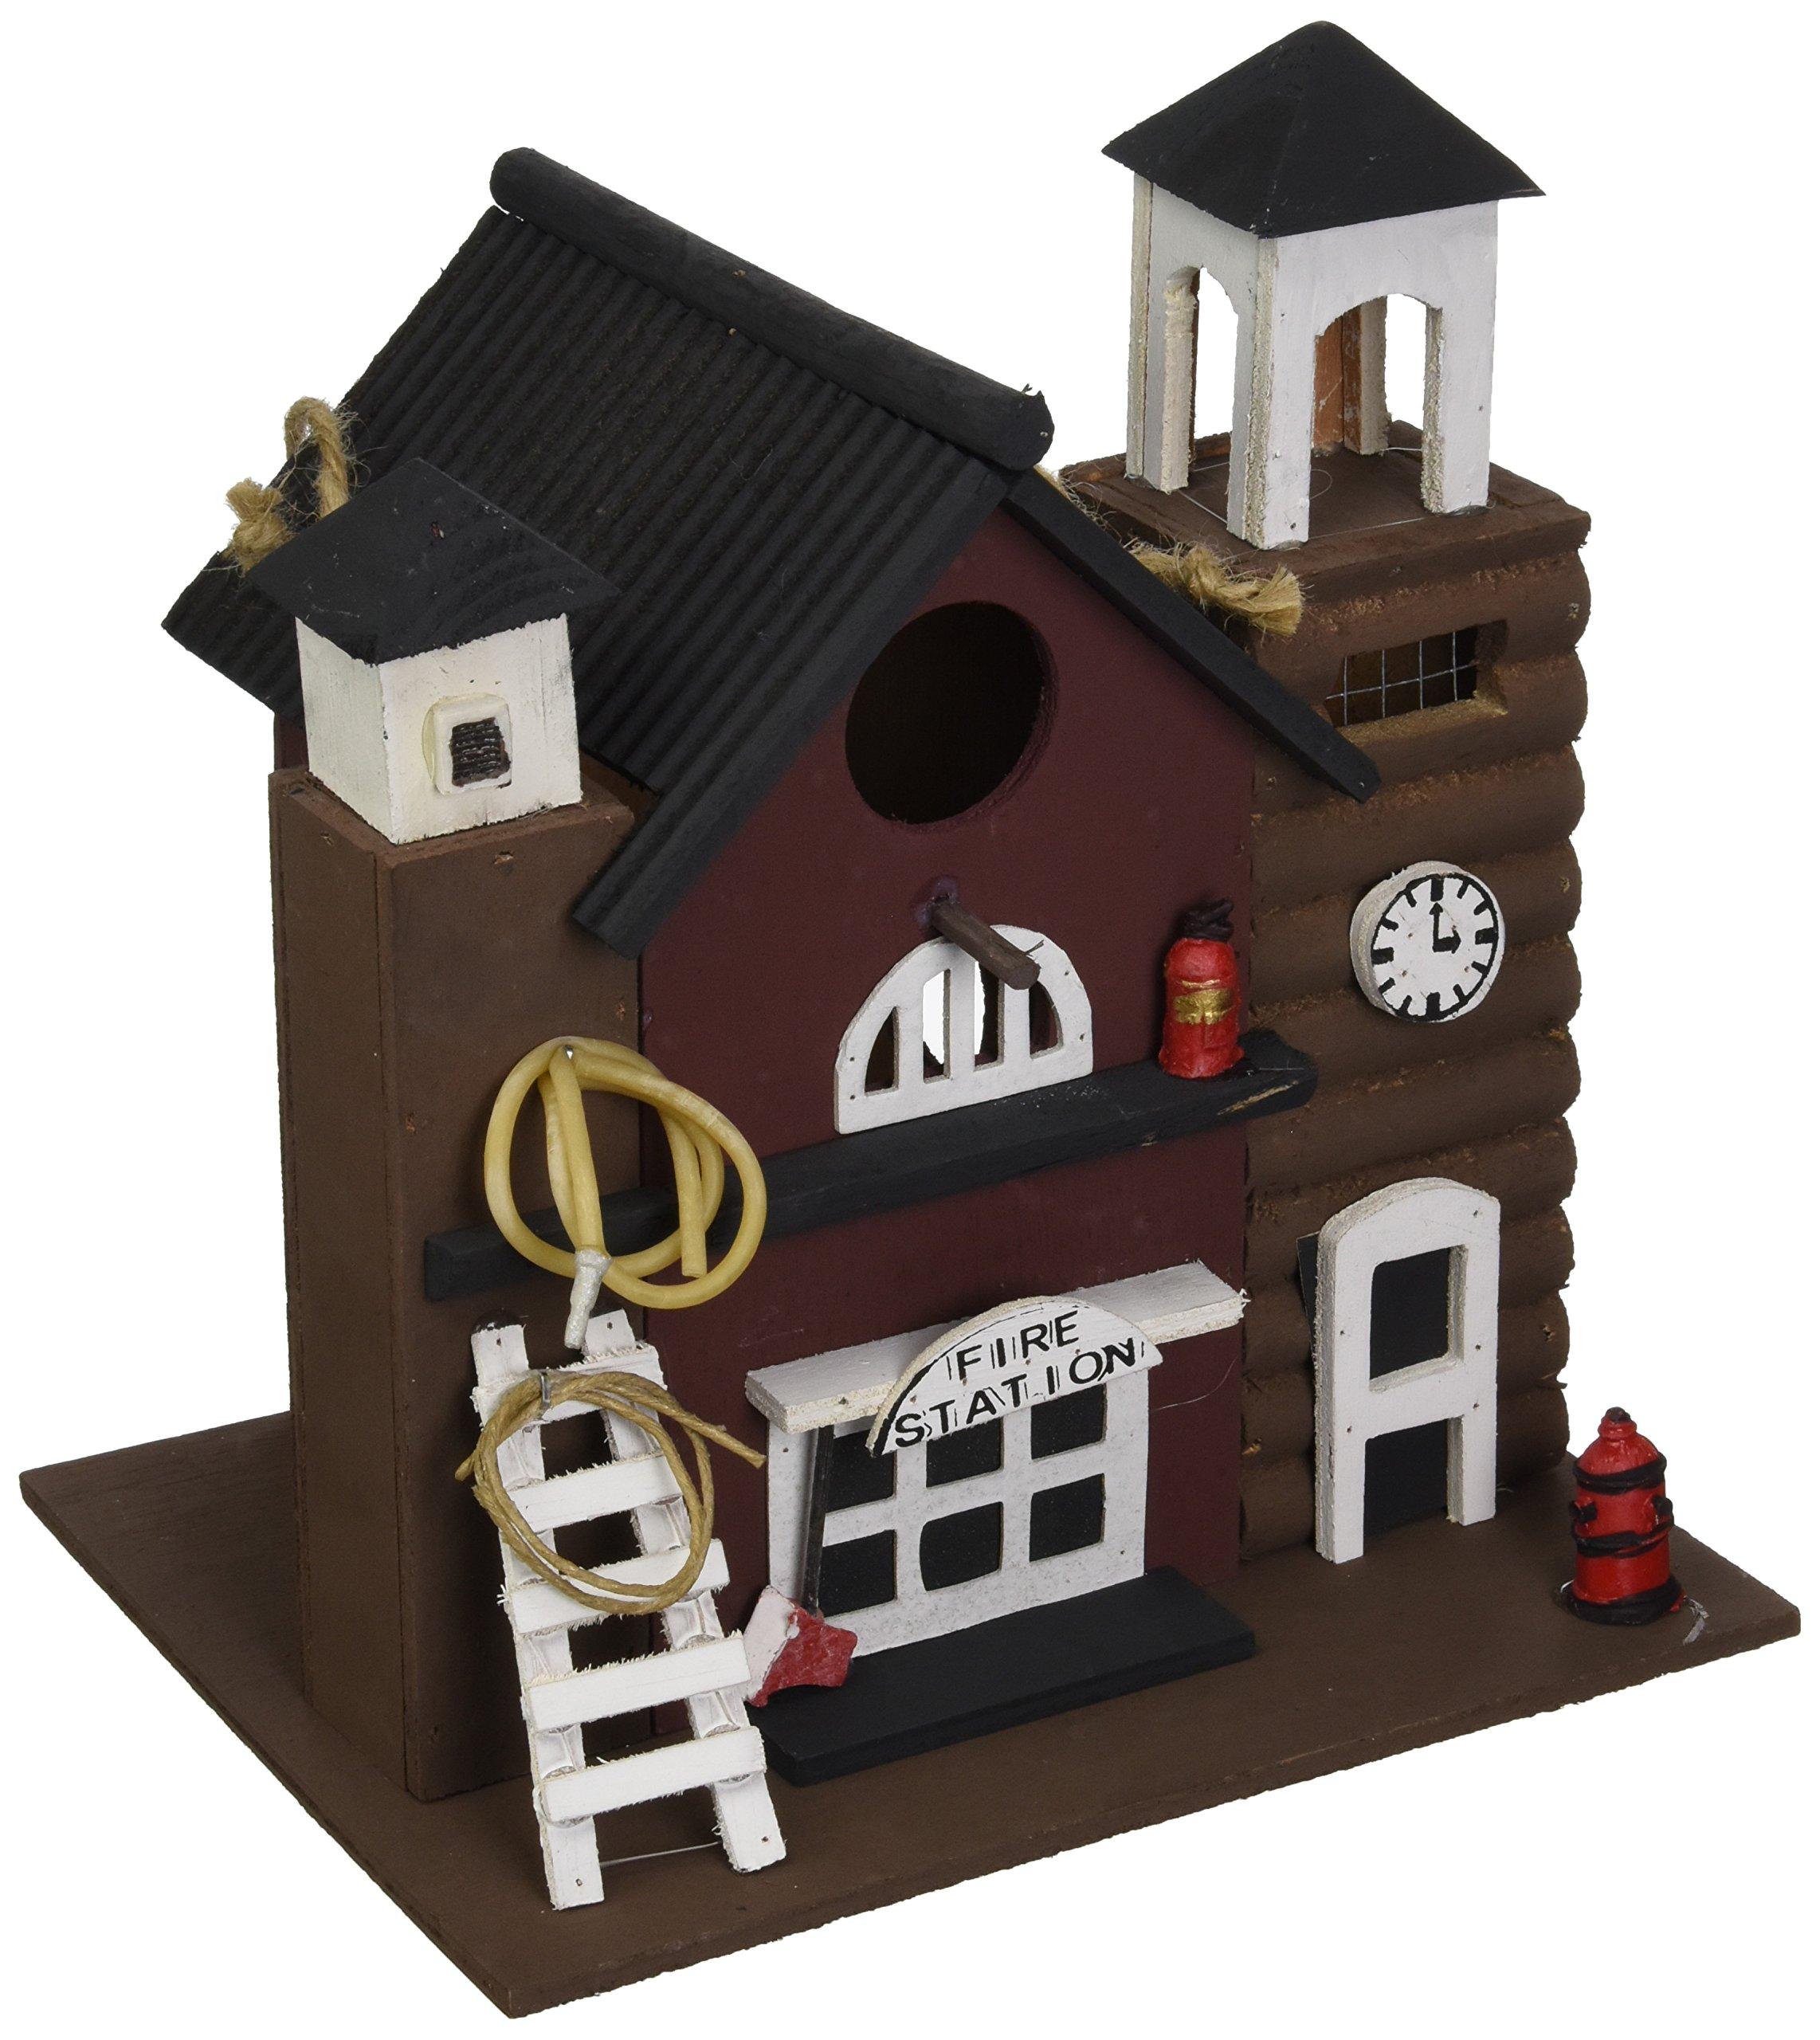 Koehlerhomedecor Koehler Home Decor Fire Station Birdhouse